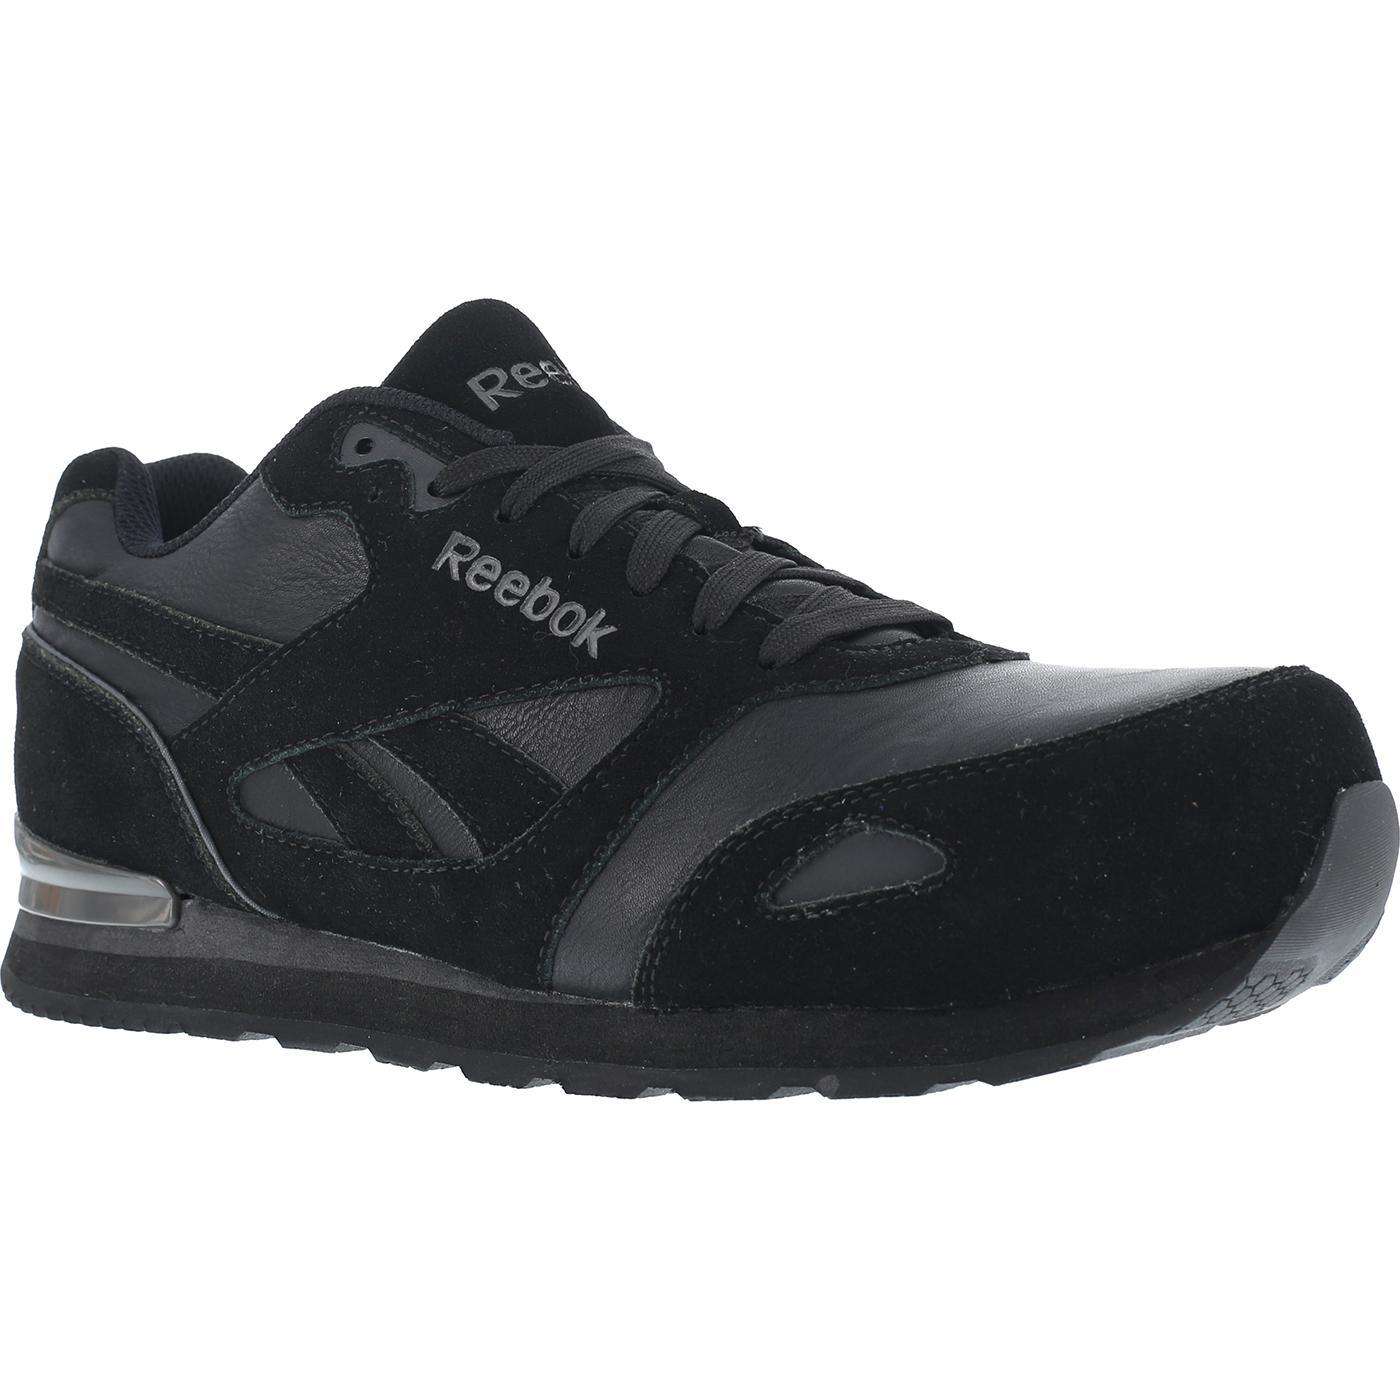 Reebok Prelaris Composite Toe SlipResistant Work Athletic Shoe  large